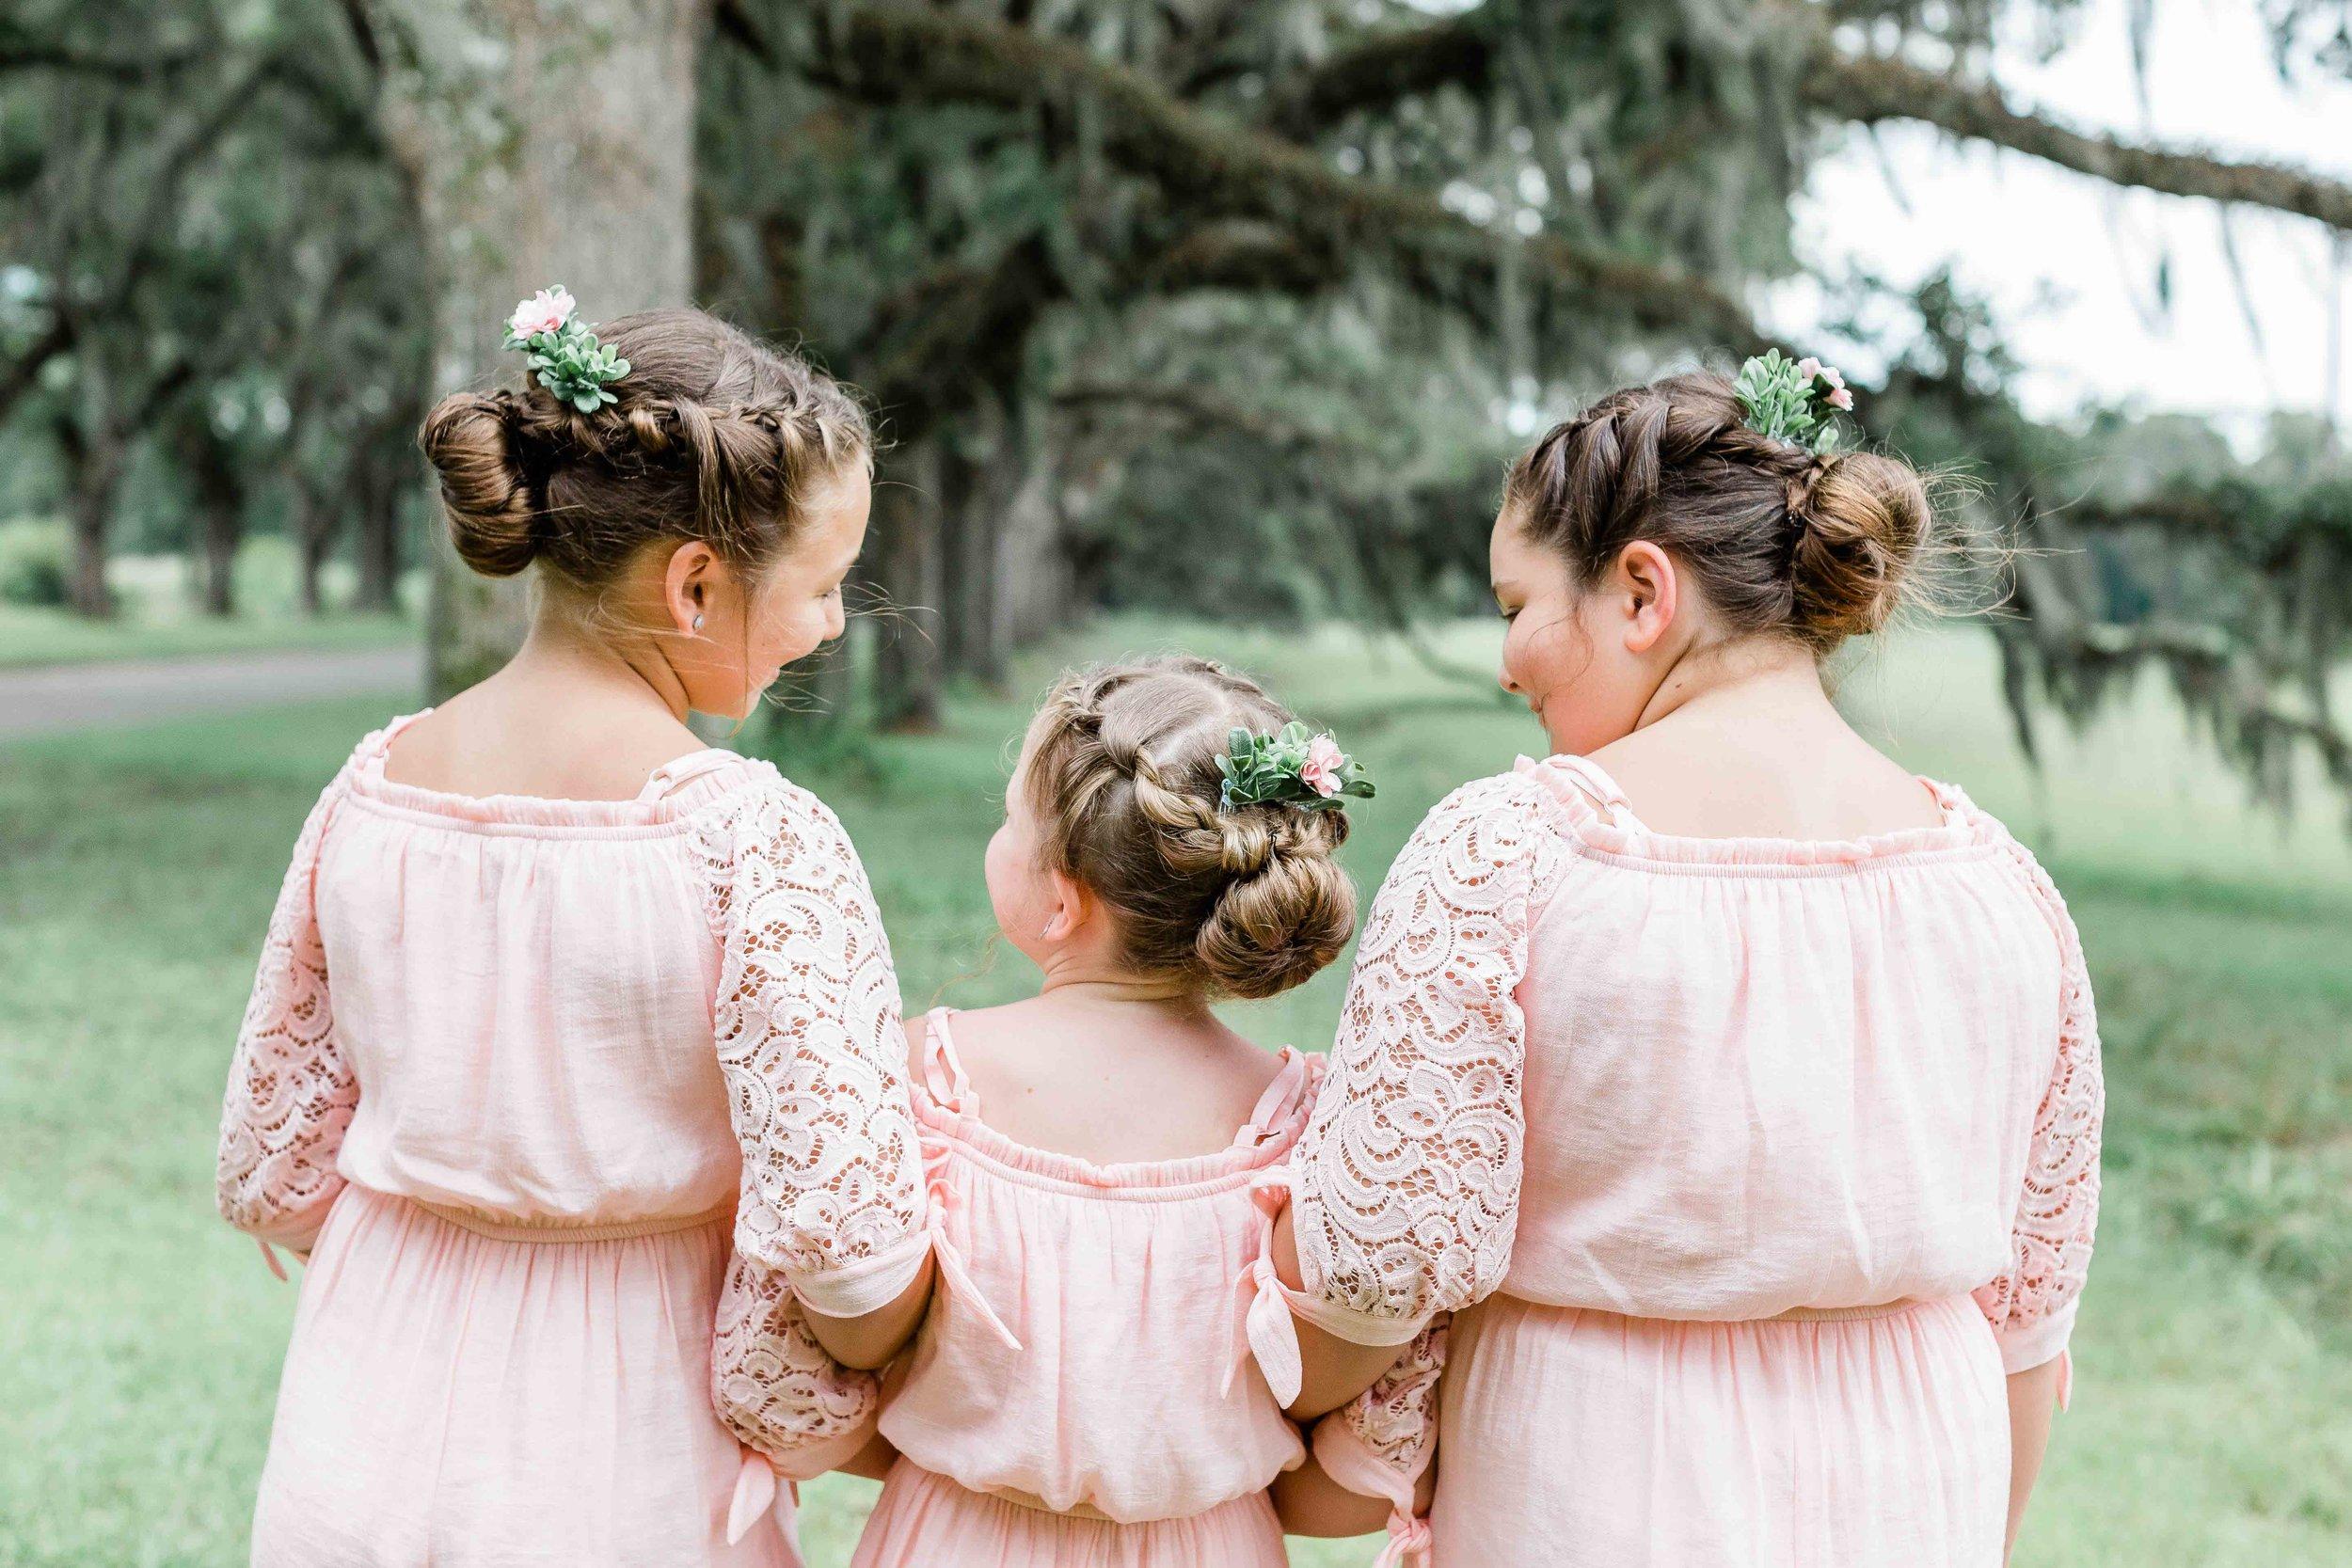 20190727Georgia-Wormlsoe Plantation-Simply Eloped-Savannah Wedding Photographer- Southern Lens Photography19.jpg